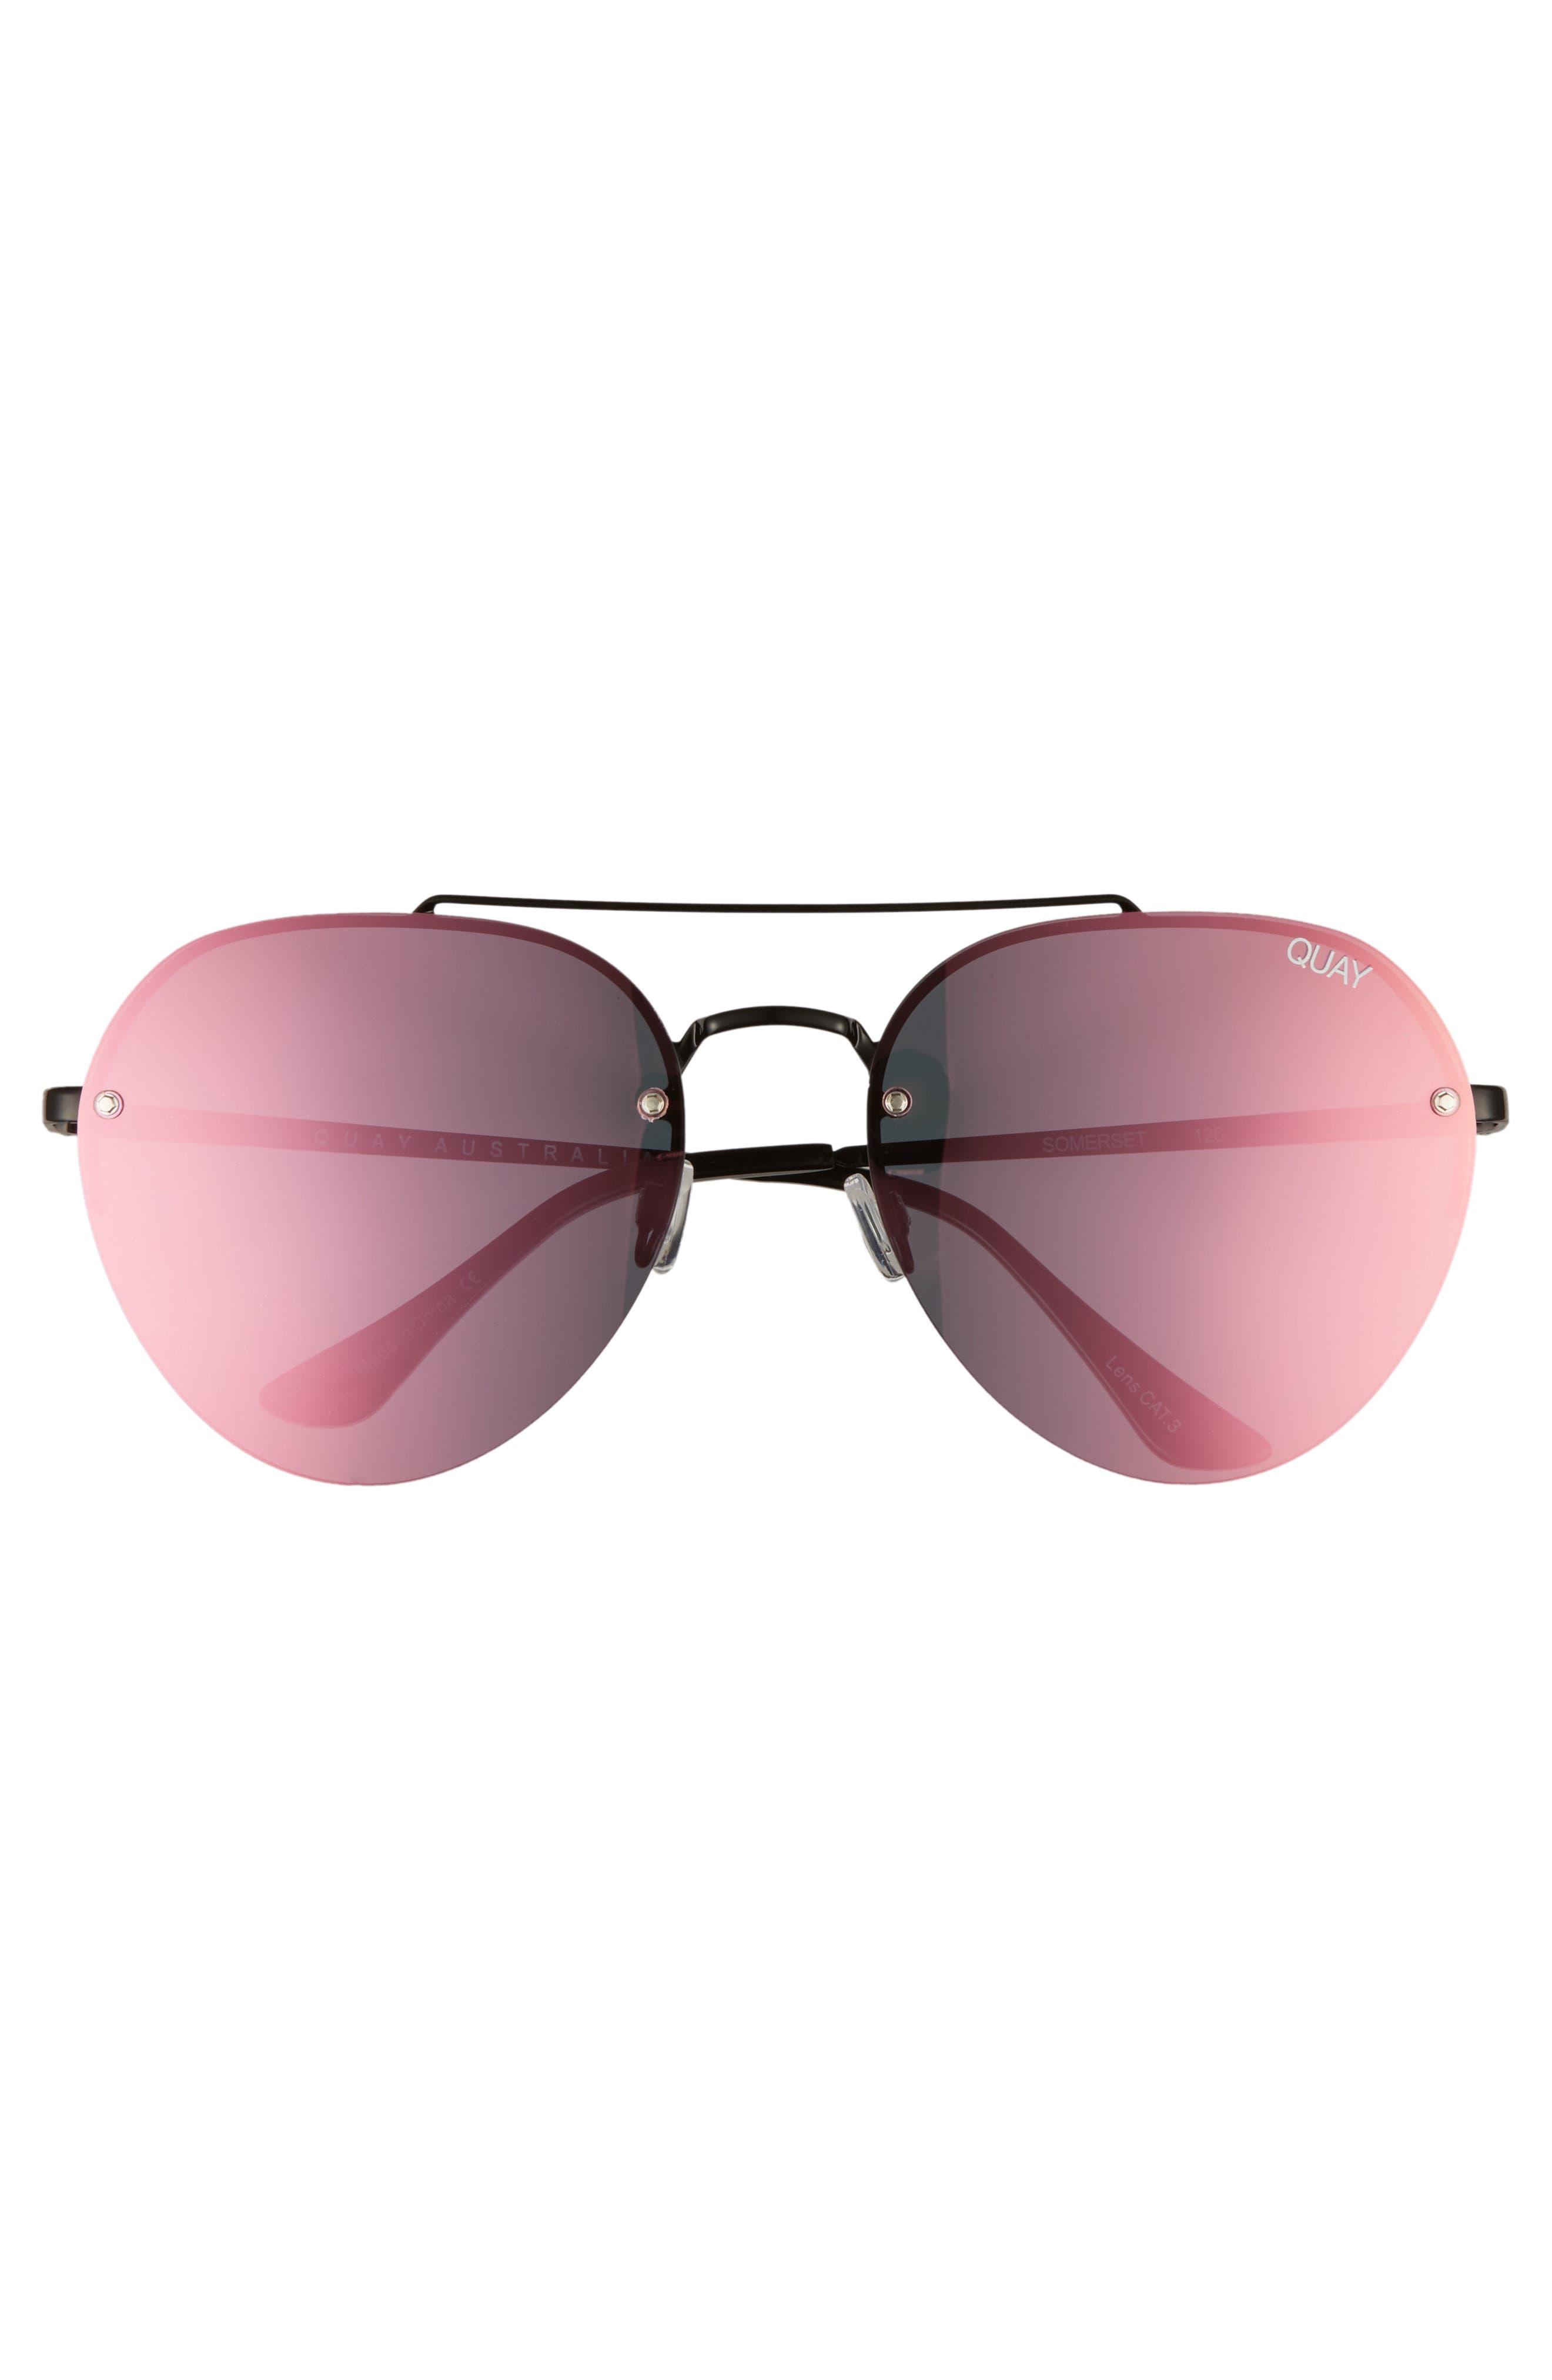 Somerset 65mm Aviator Sunglasses,                             Alternate thumbnail 8, color,                             Black/ Pink